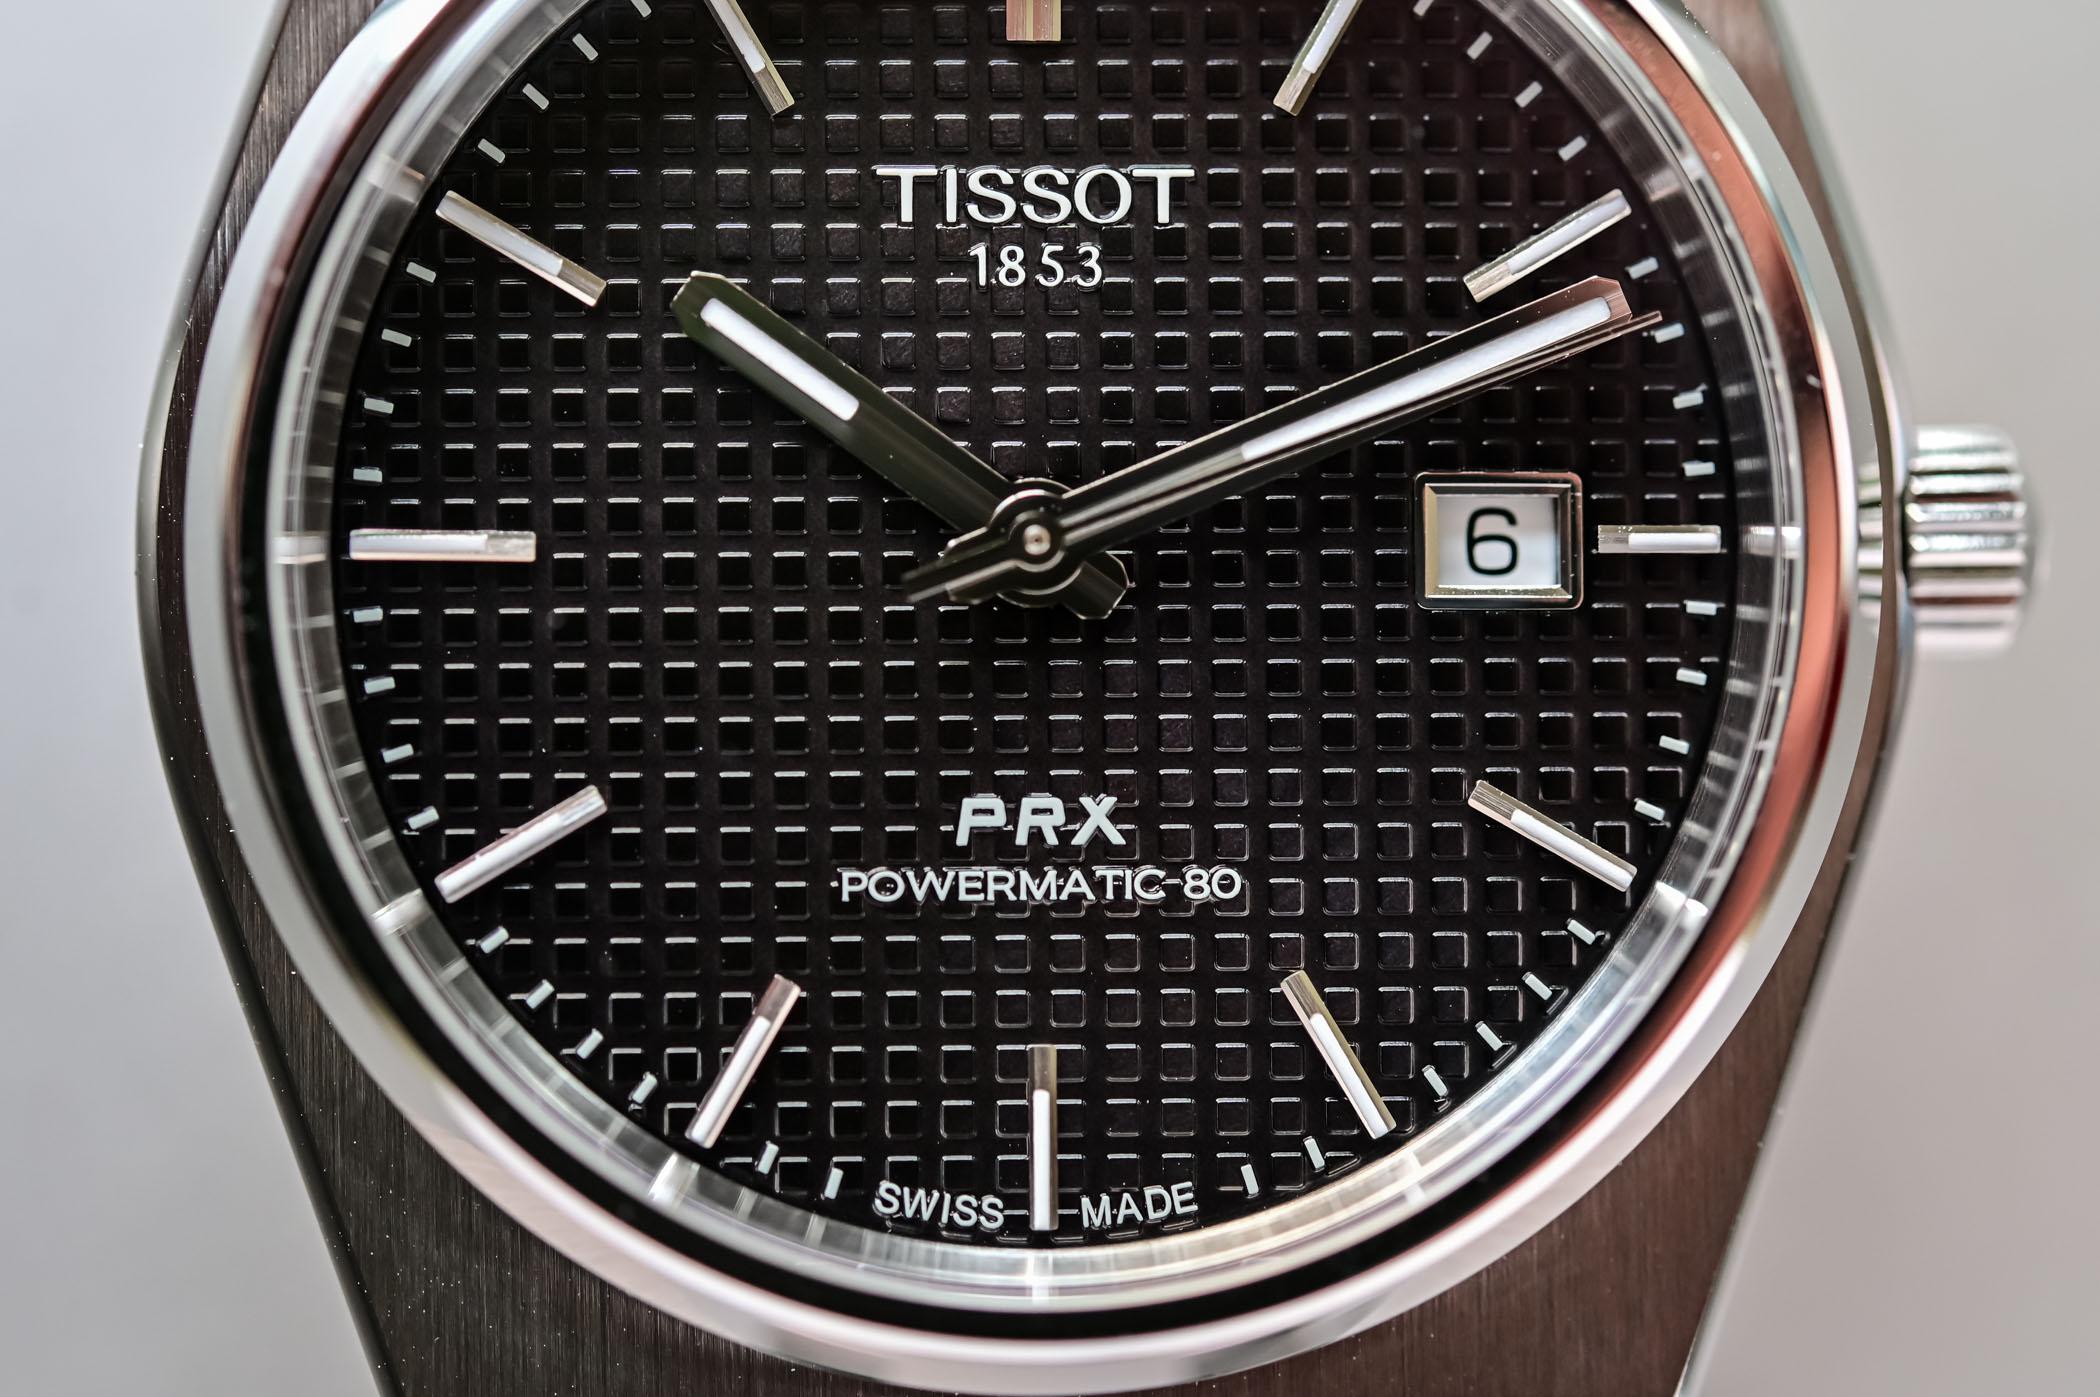 Tissot PRX 40 205 Powermatic 80 - T137.407.11.051.00